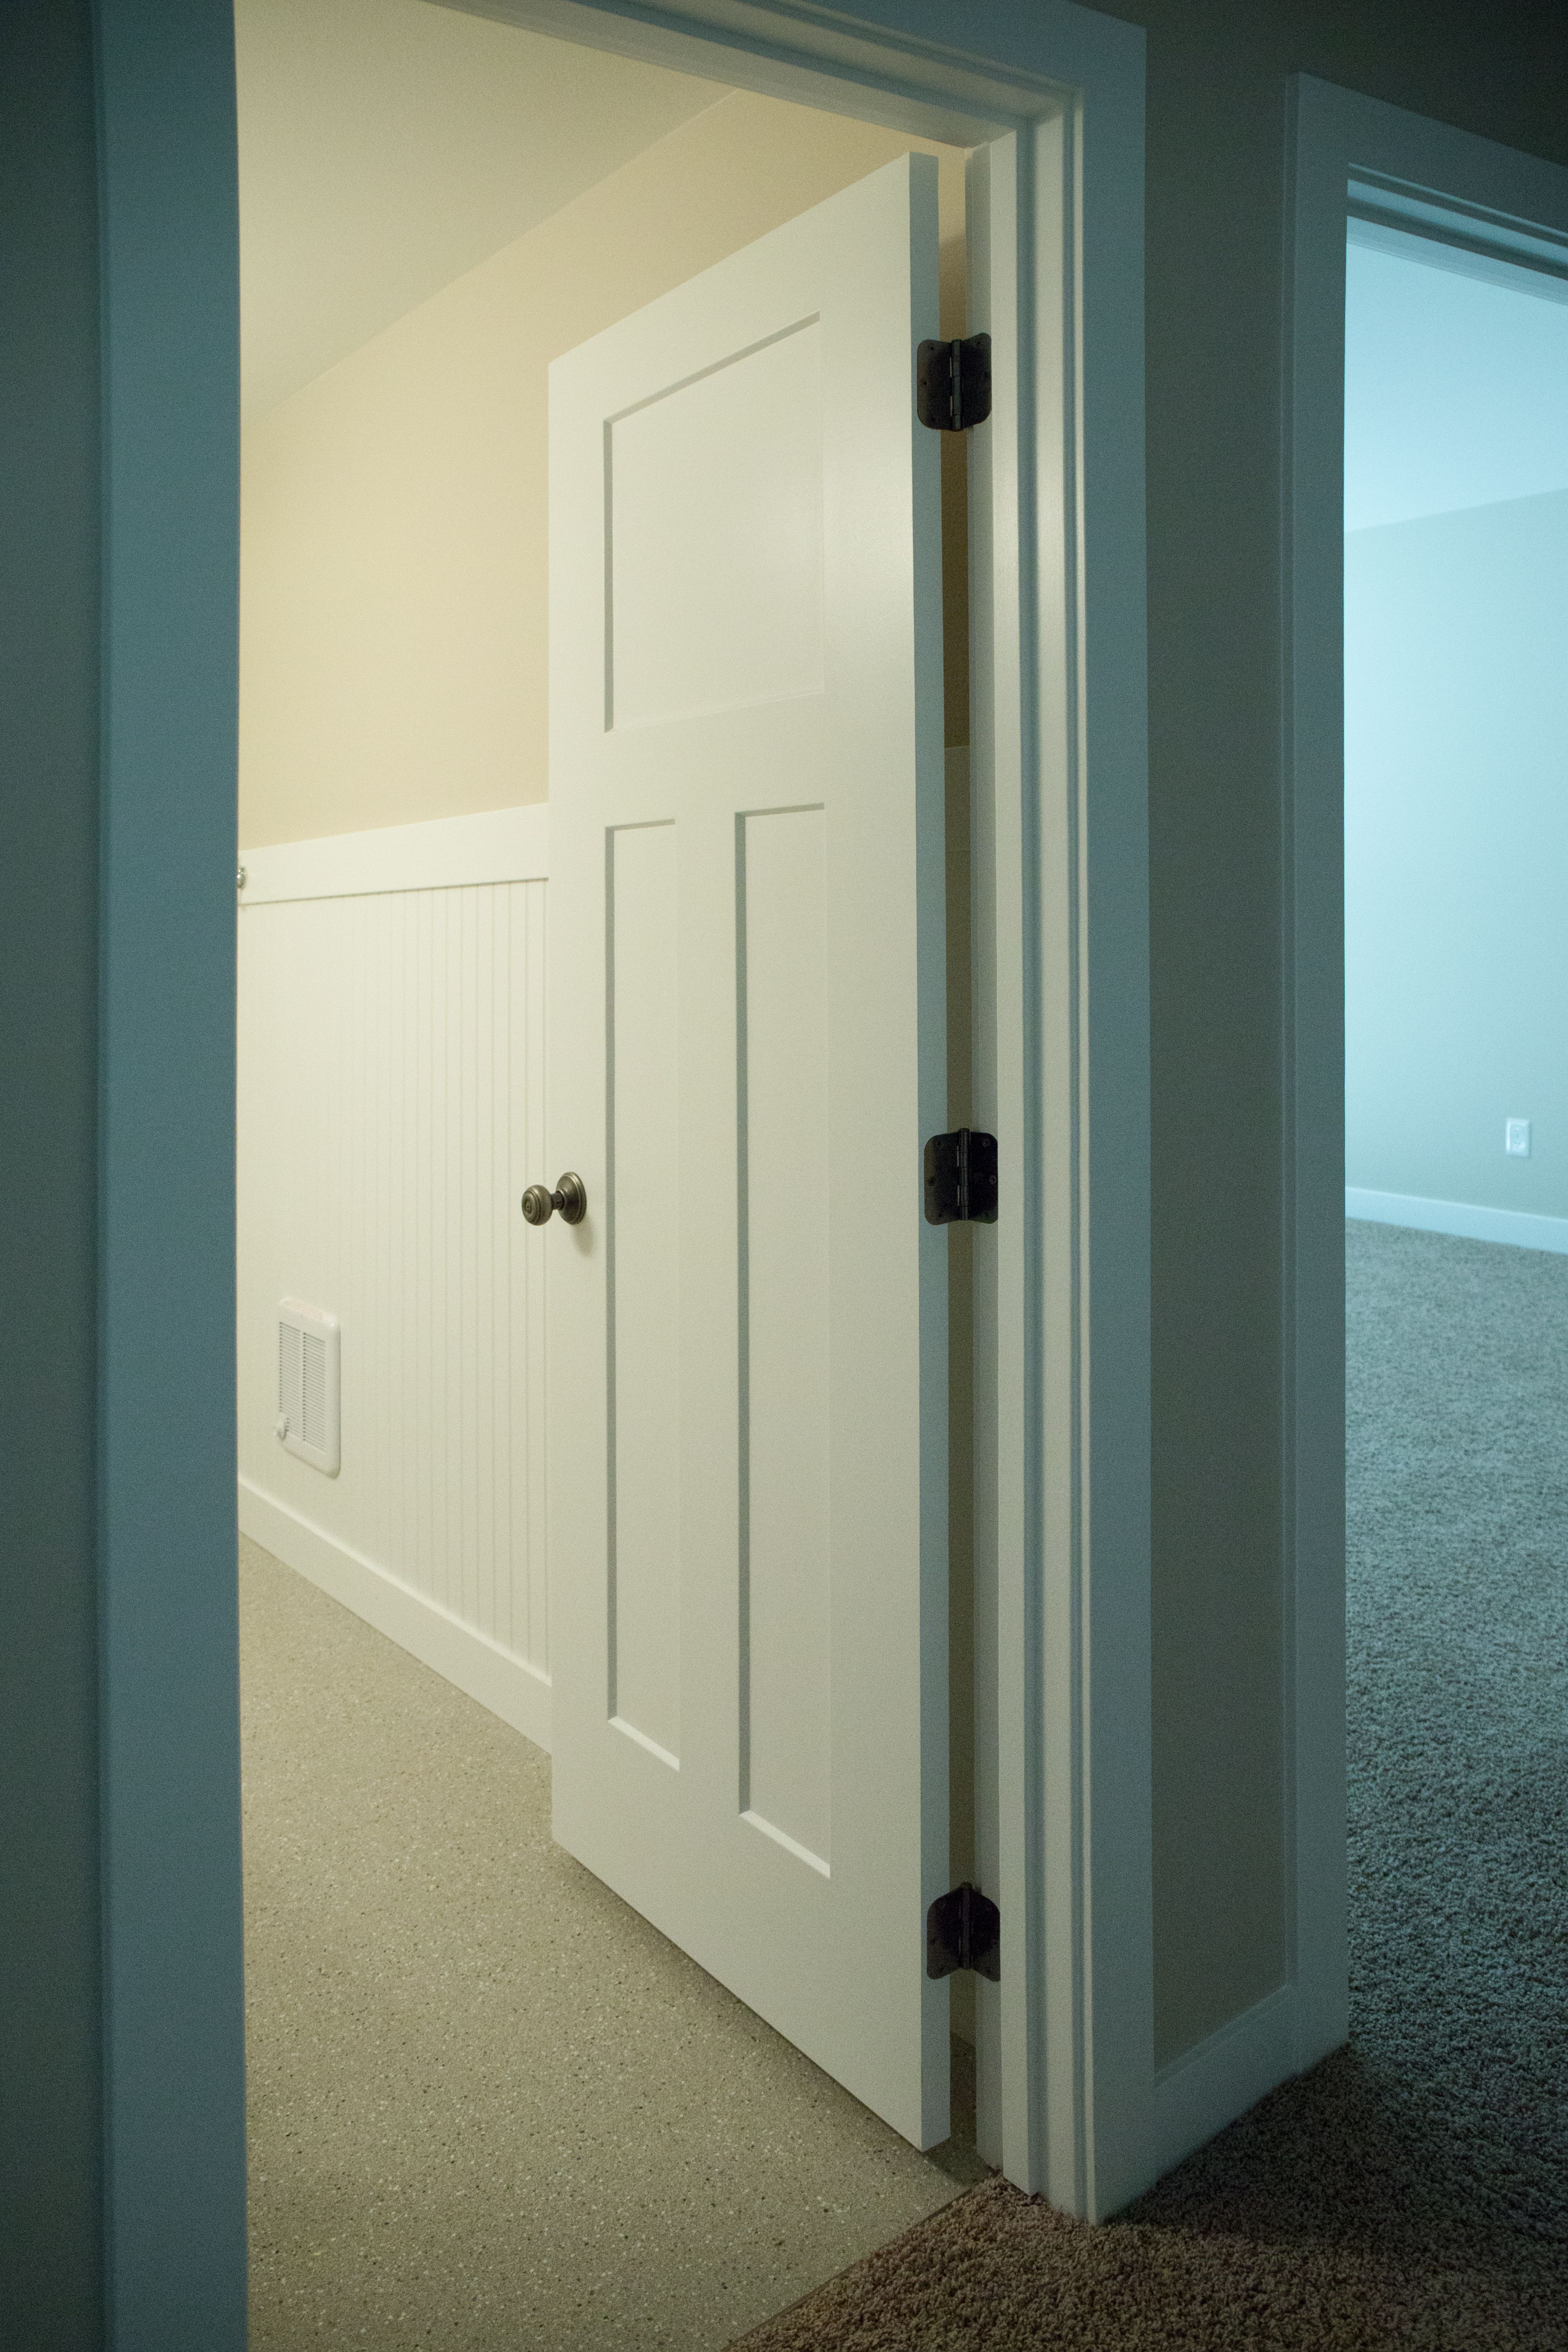 Interior doors a crisp painted white three panel interior door interior doors a crisp painted white three panel interior door with contrasting planetlyrics Gallery